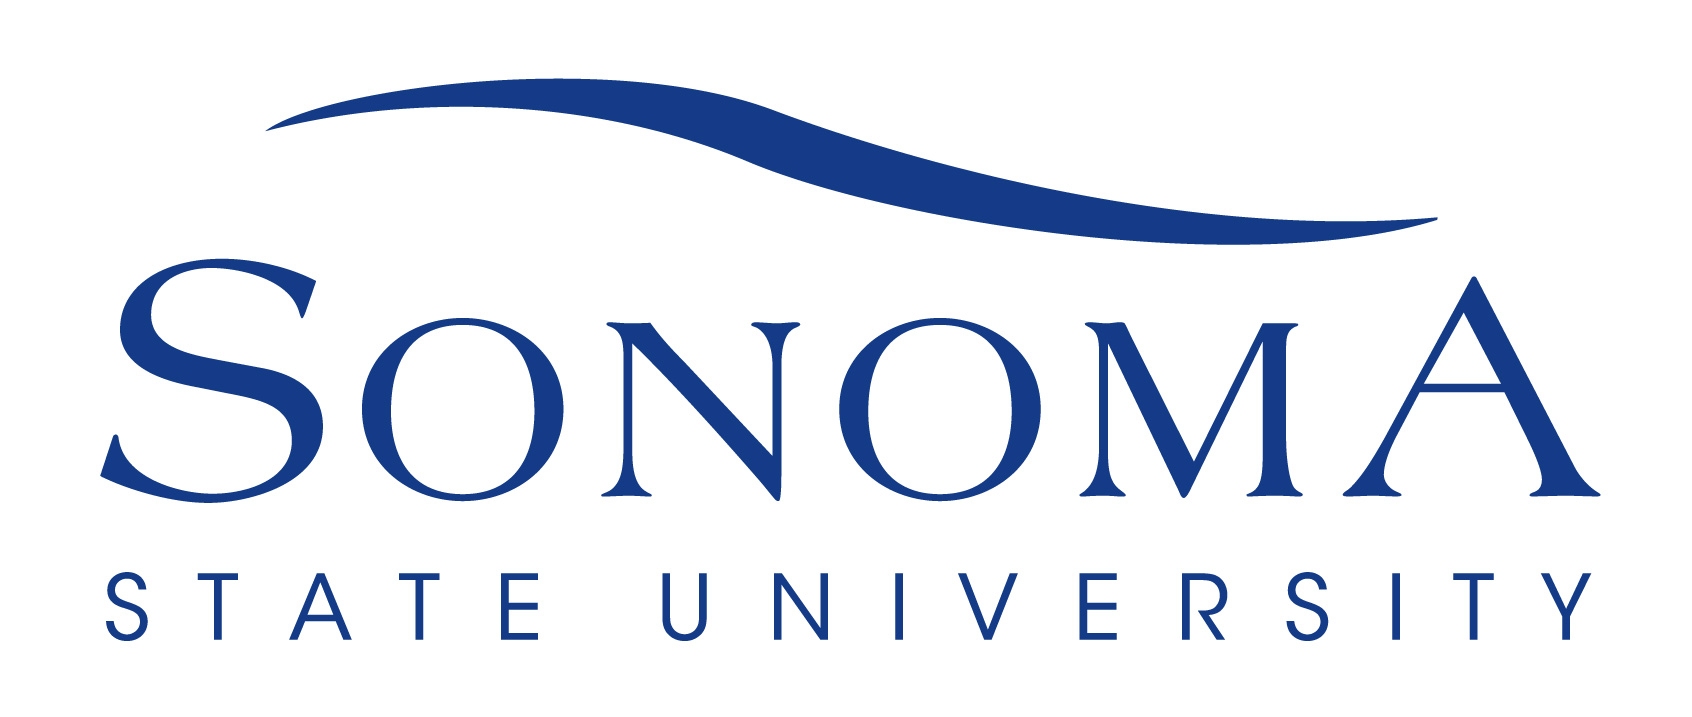 Sonoma State University Photo Gallery